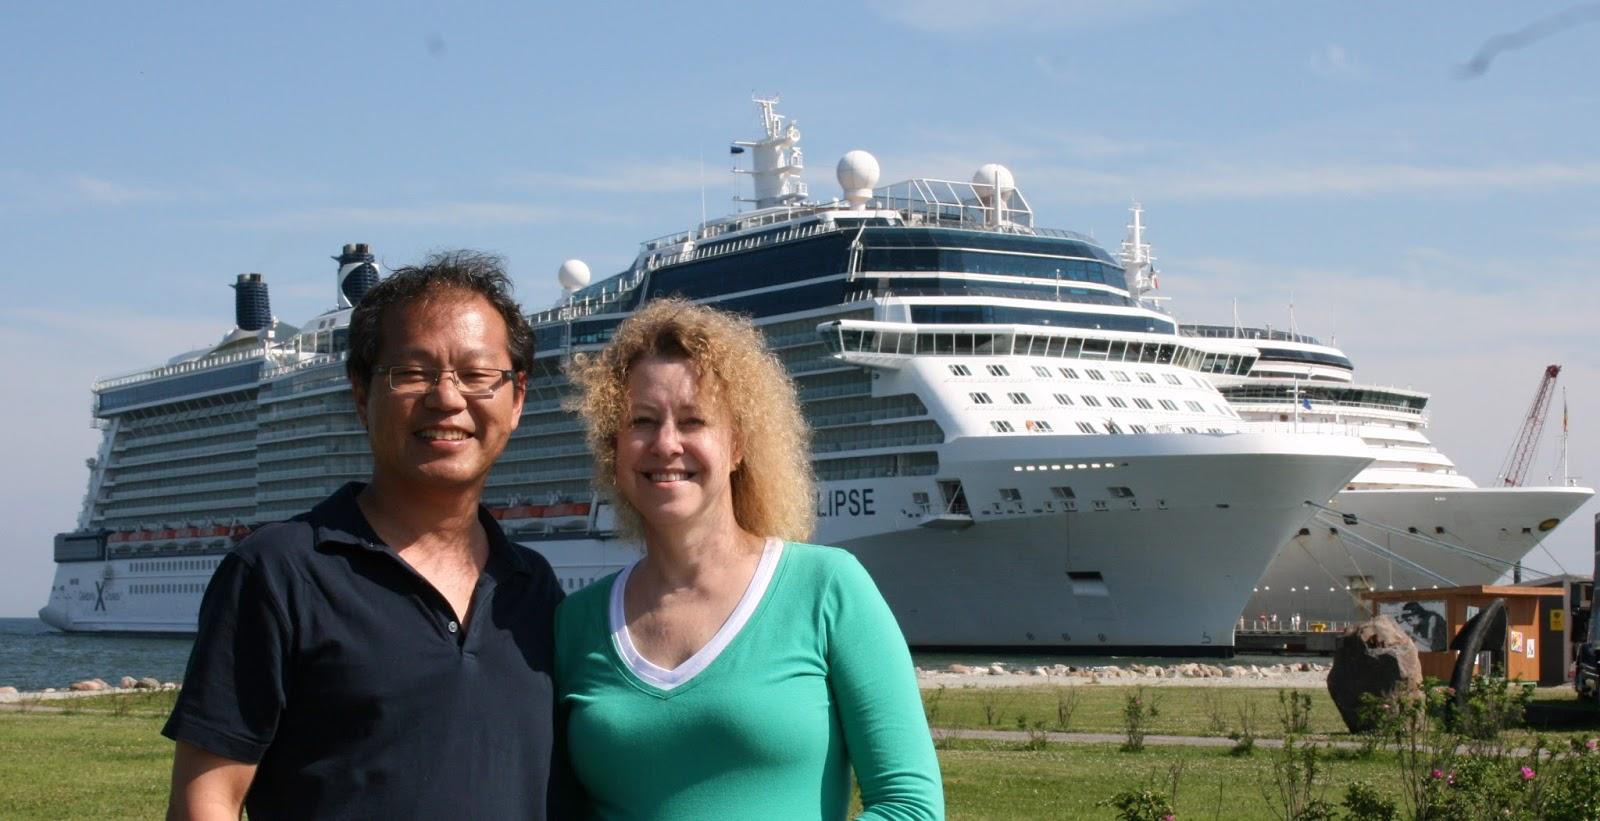 Kathy sabine husband chiseled in rock august 2013